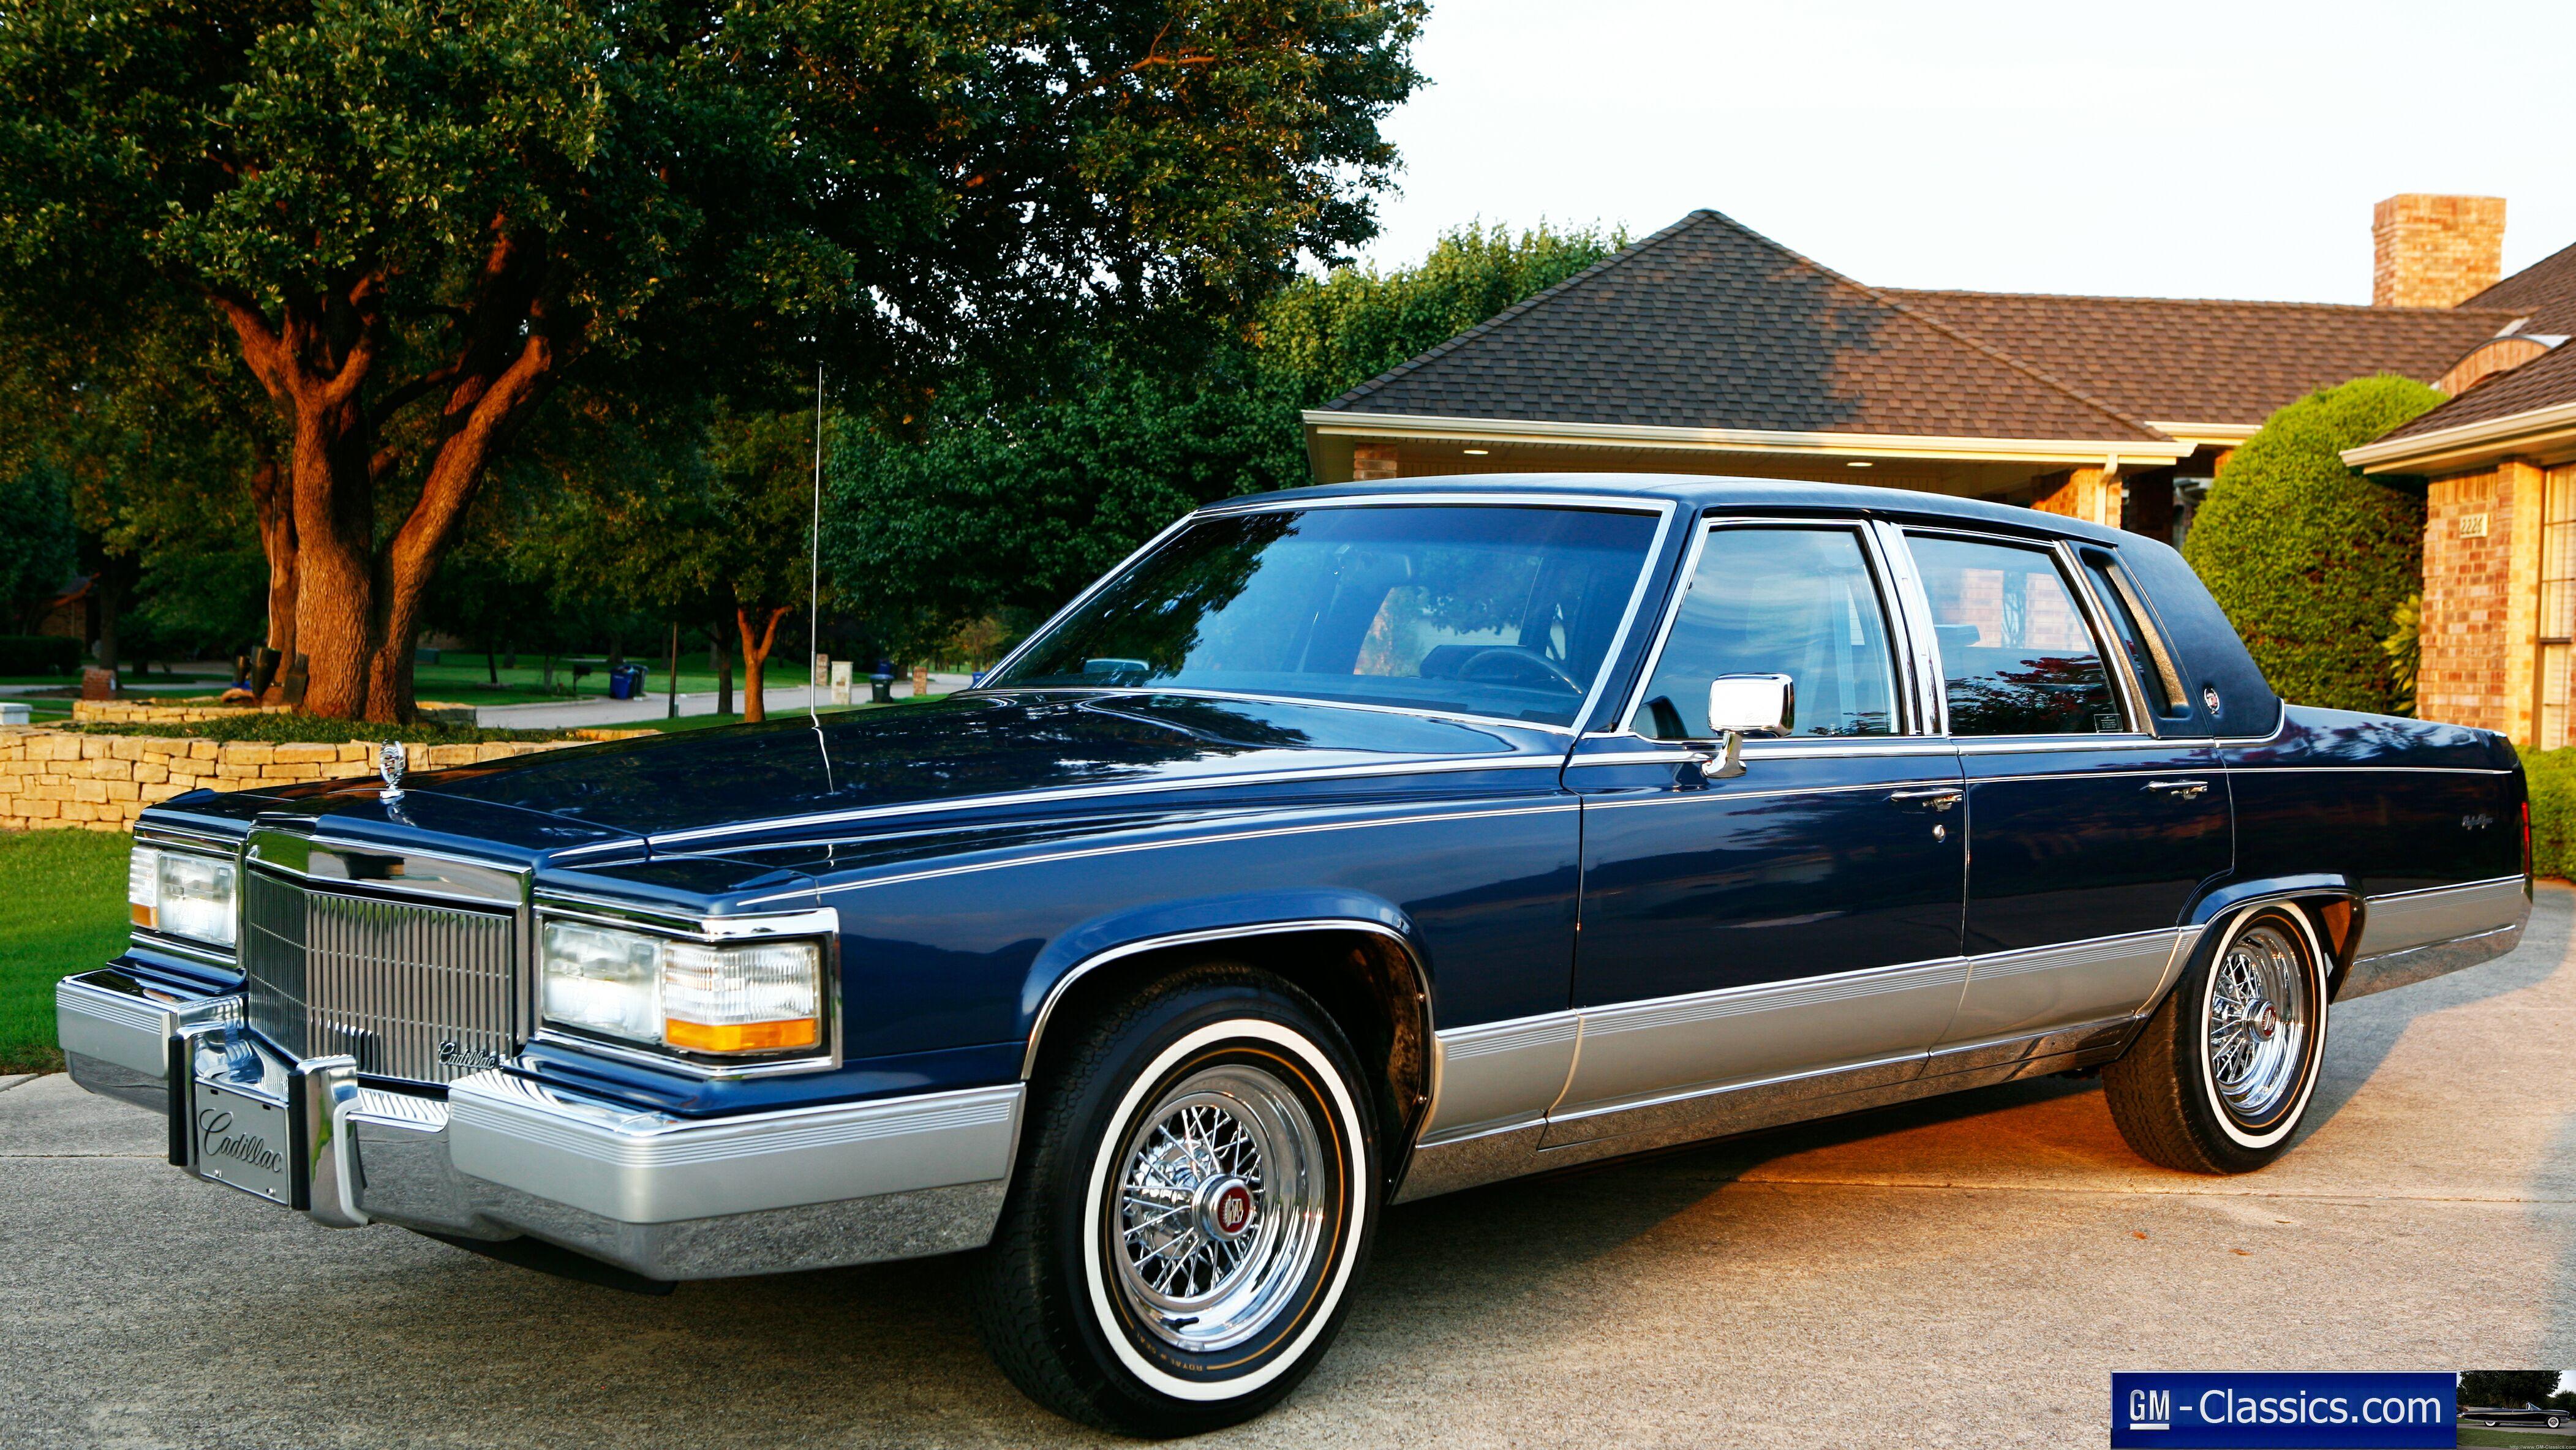 1990 Cadillac Fleetwood Brougham - Matt Garrett